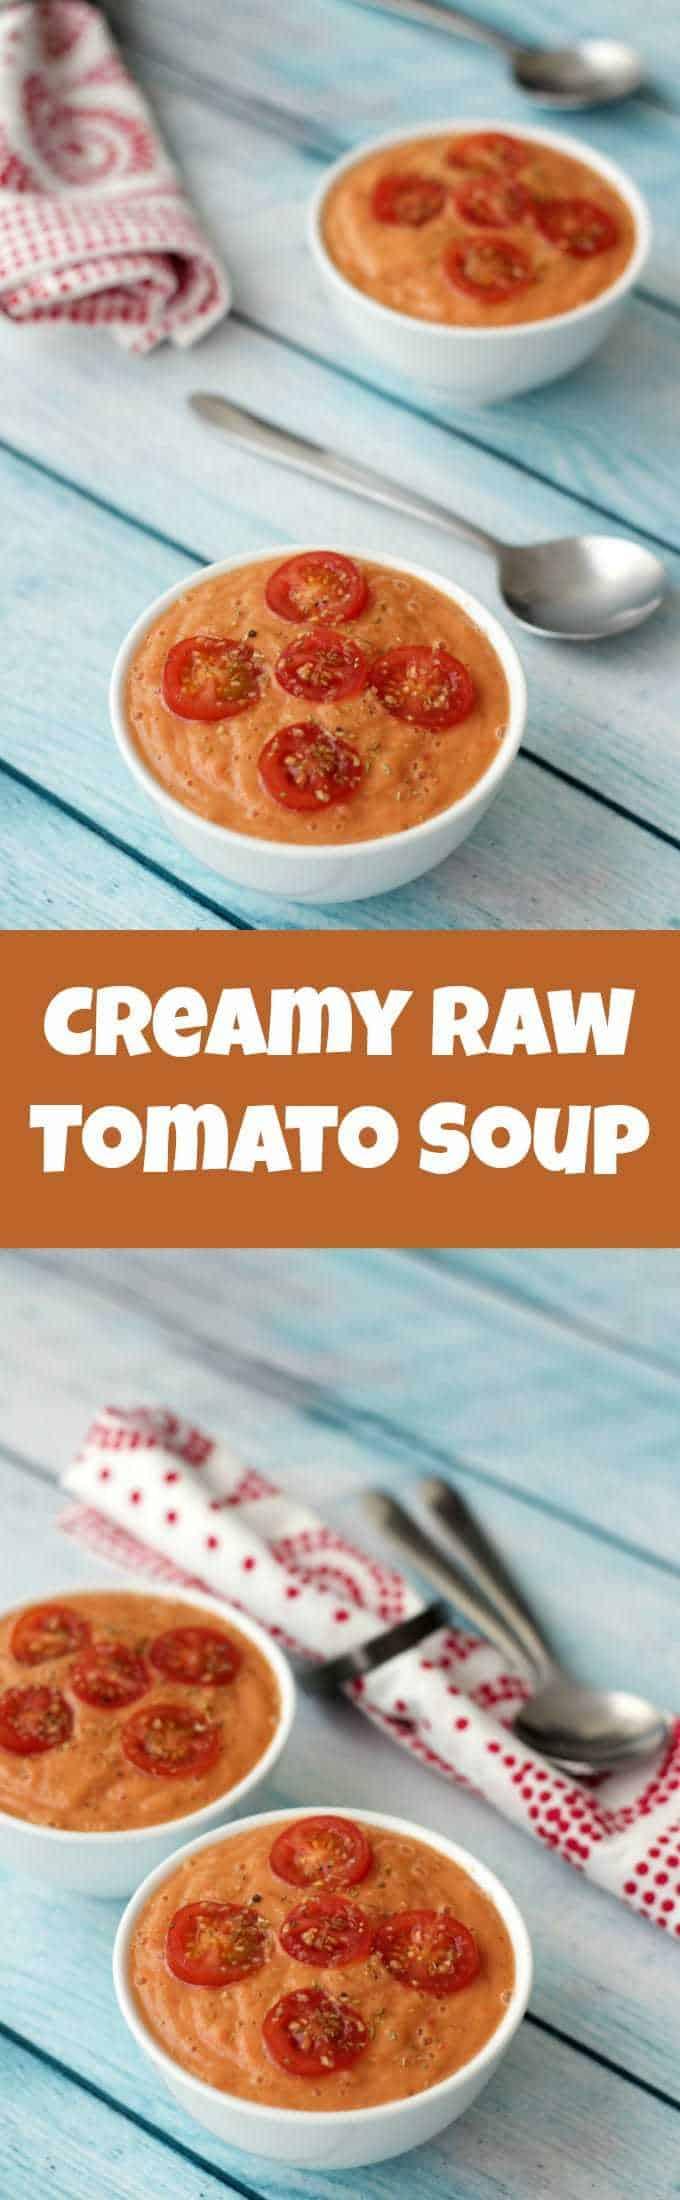 Creamy Raw Tomato Soup #vegan #rawvegan #dairyfree #lovingitvegan